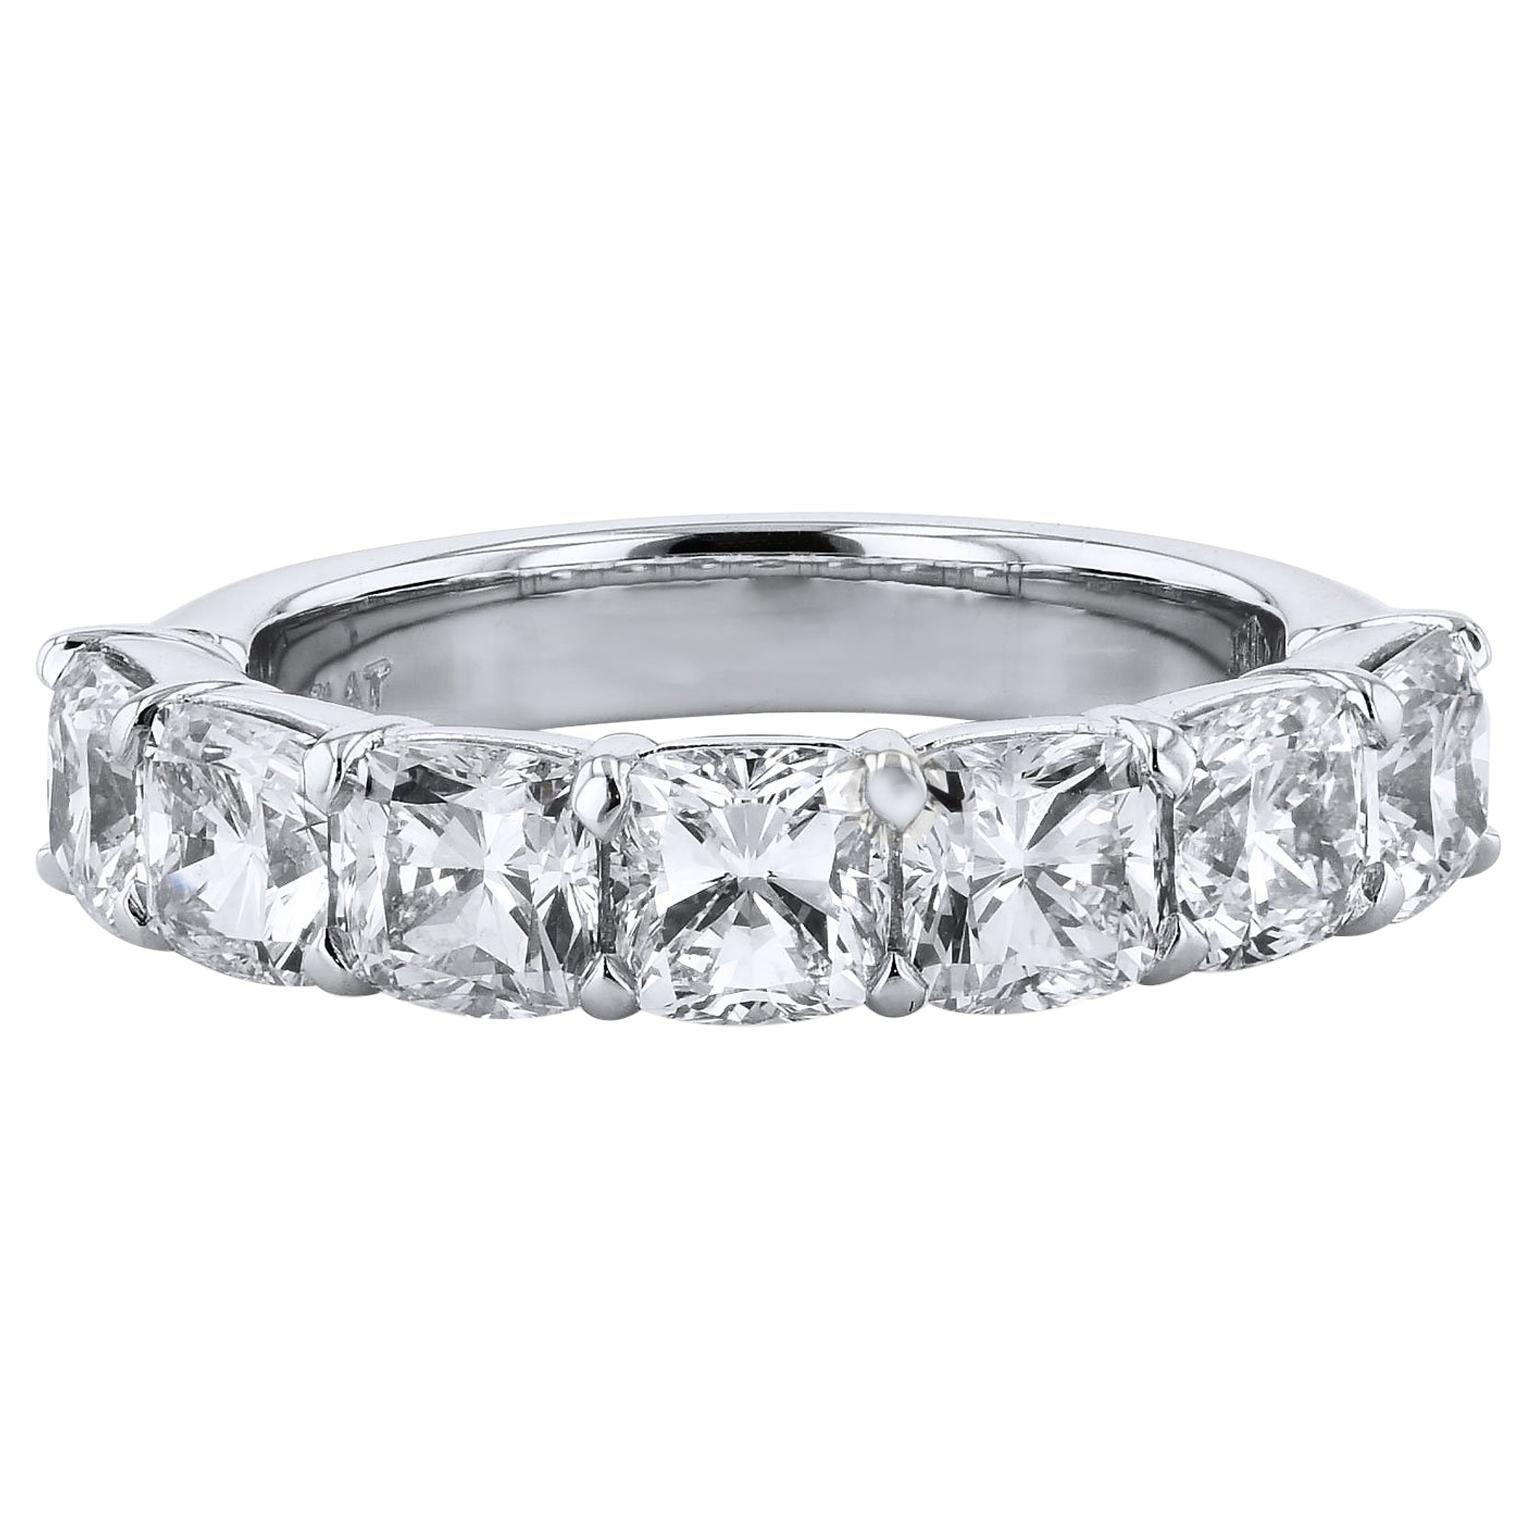 3.50 Carat Seven Stone Cushion Cut Diamond Platinum Eternity Band 6